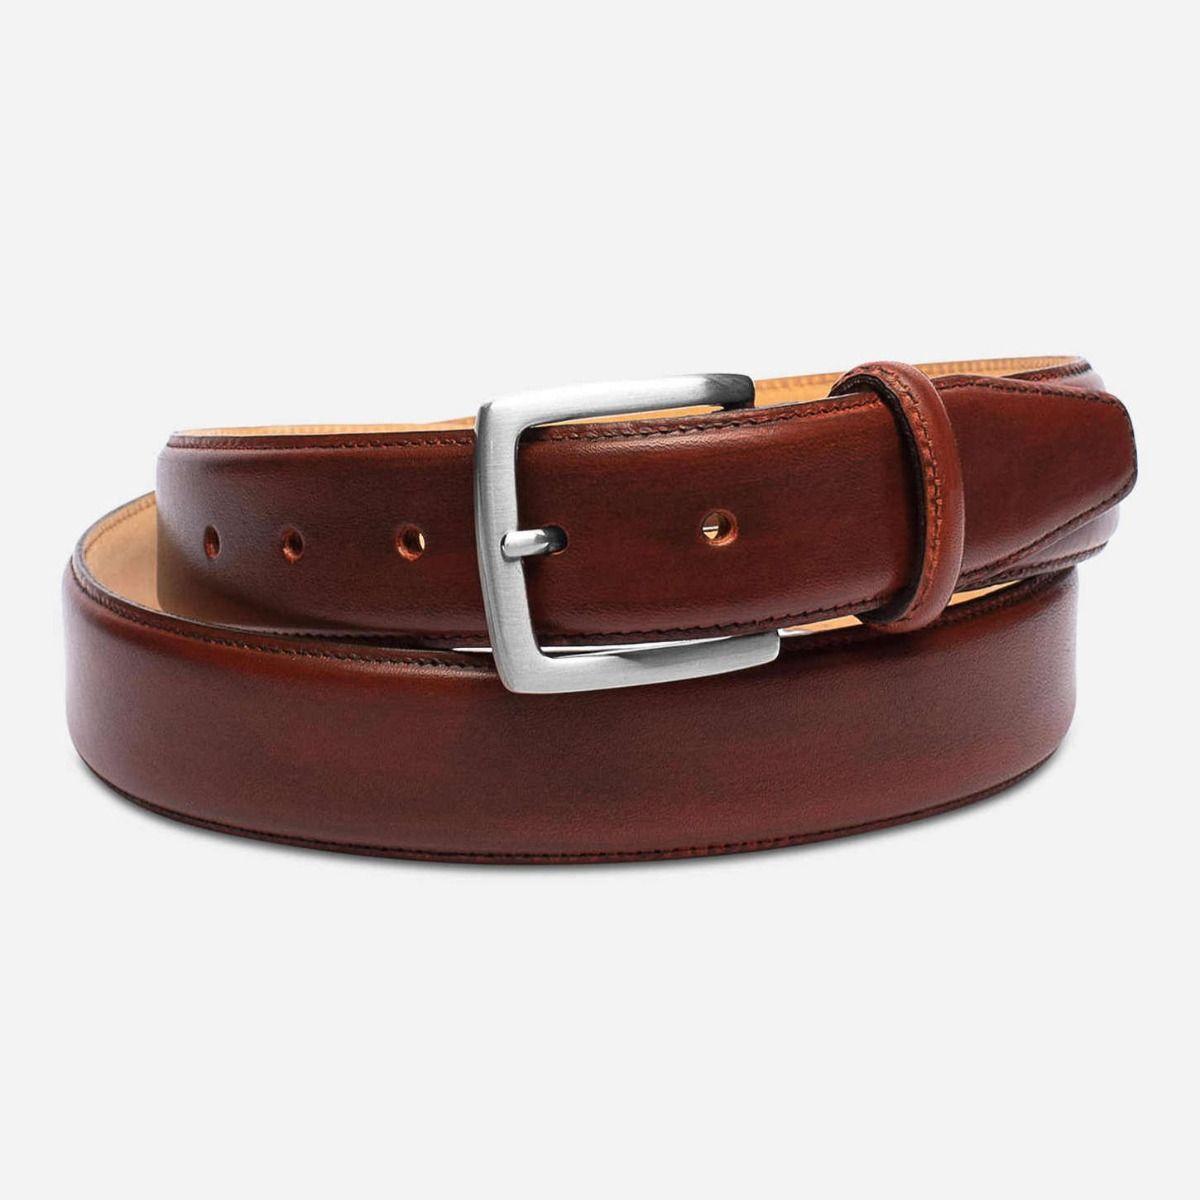 Brown Leather Belt Ends